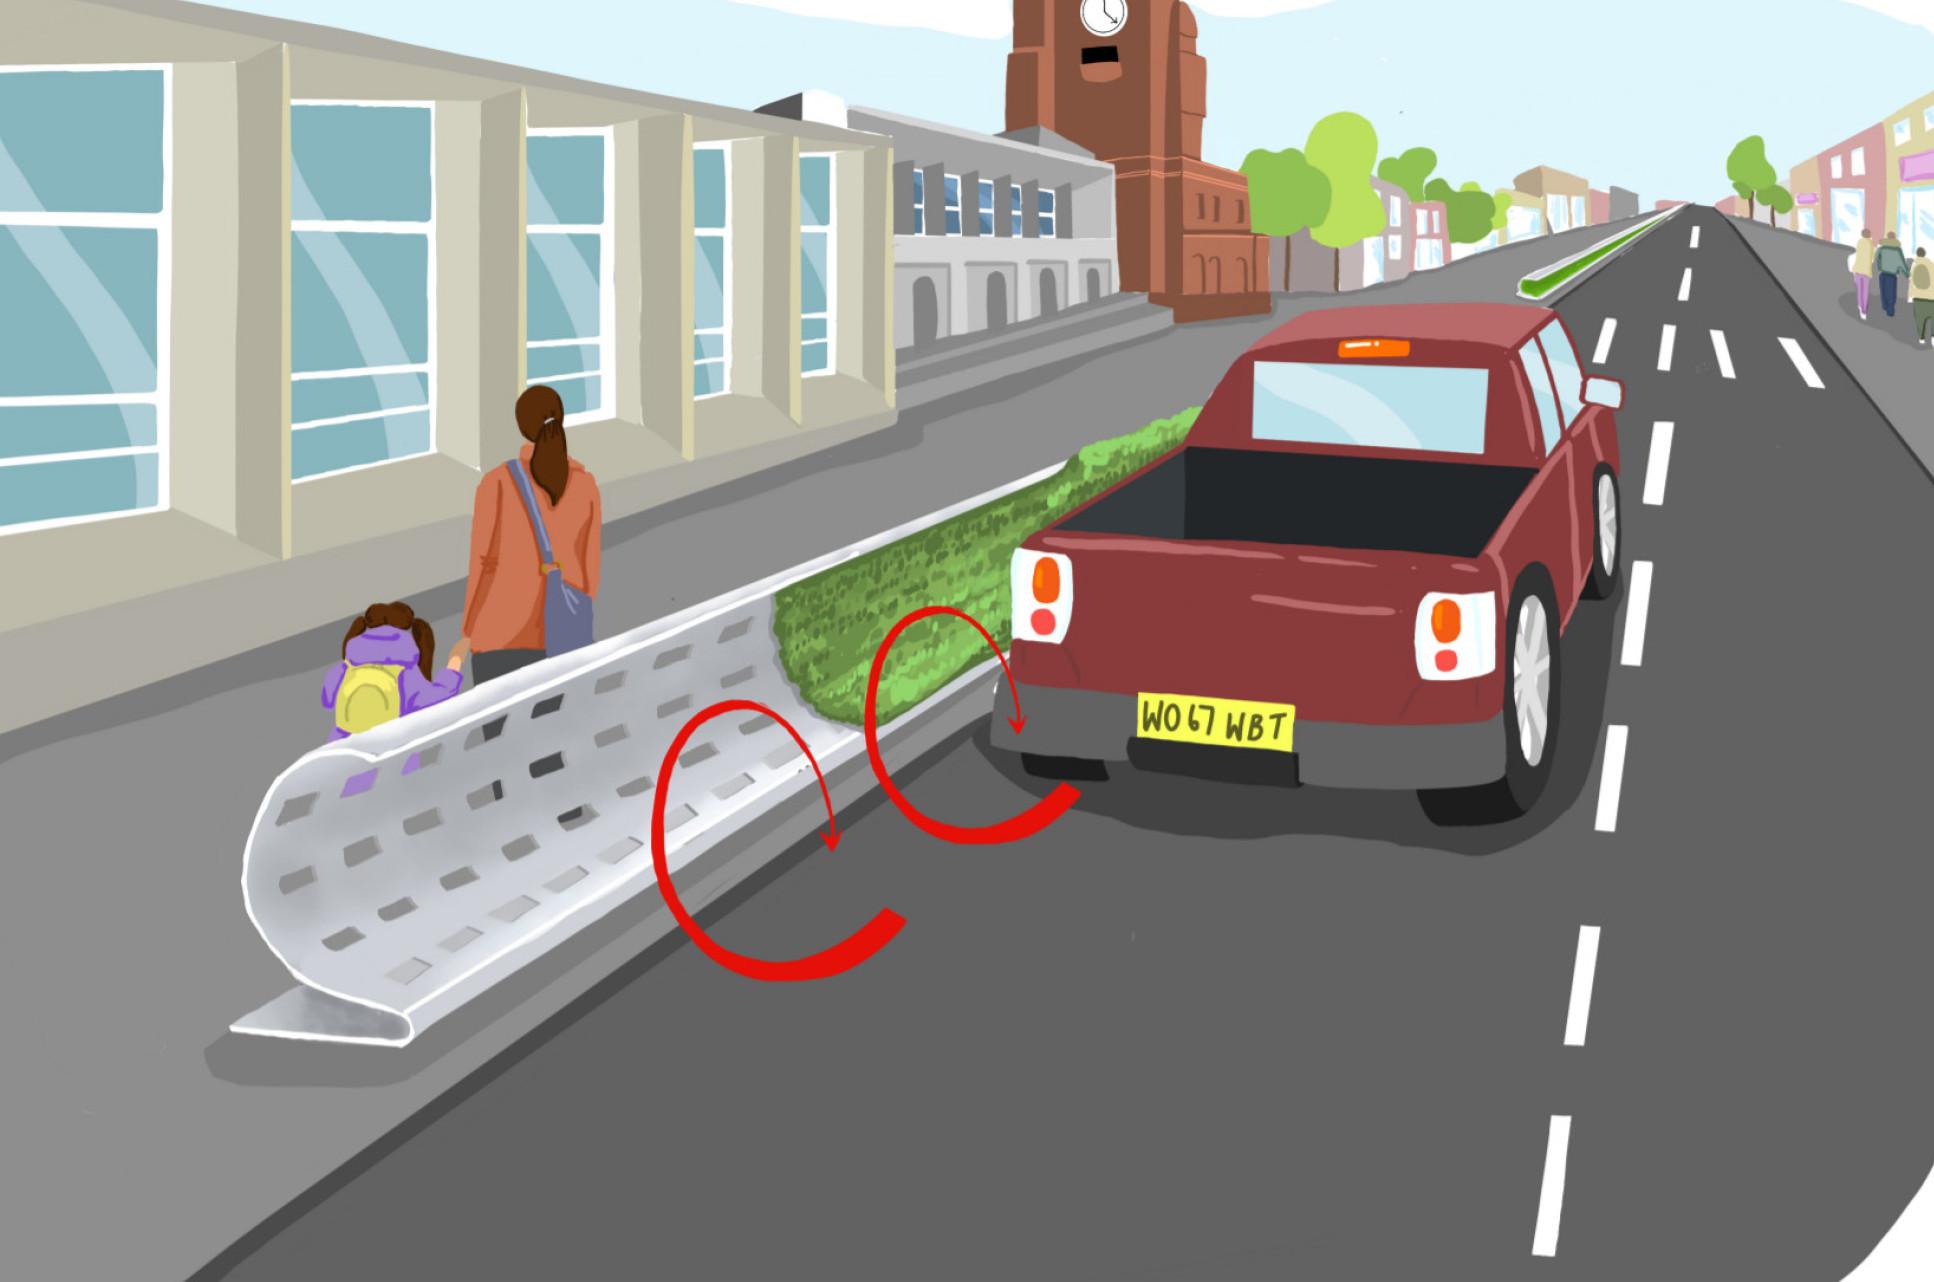 Curved roadside barrier deflecting pollution